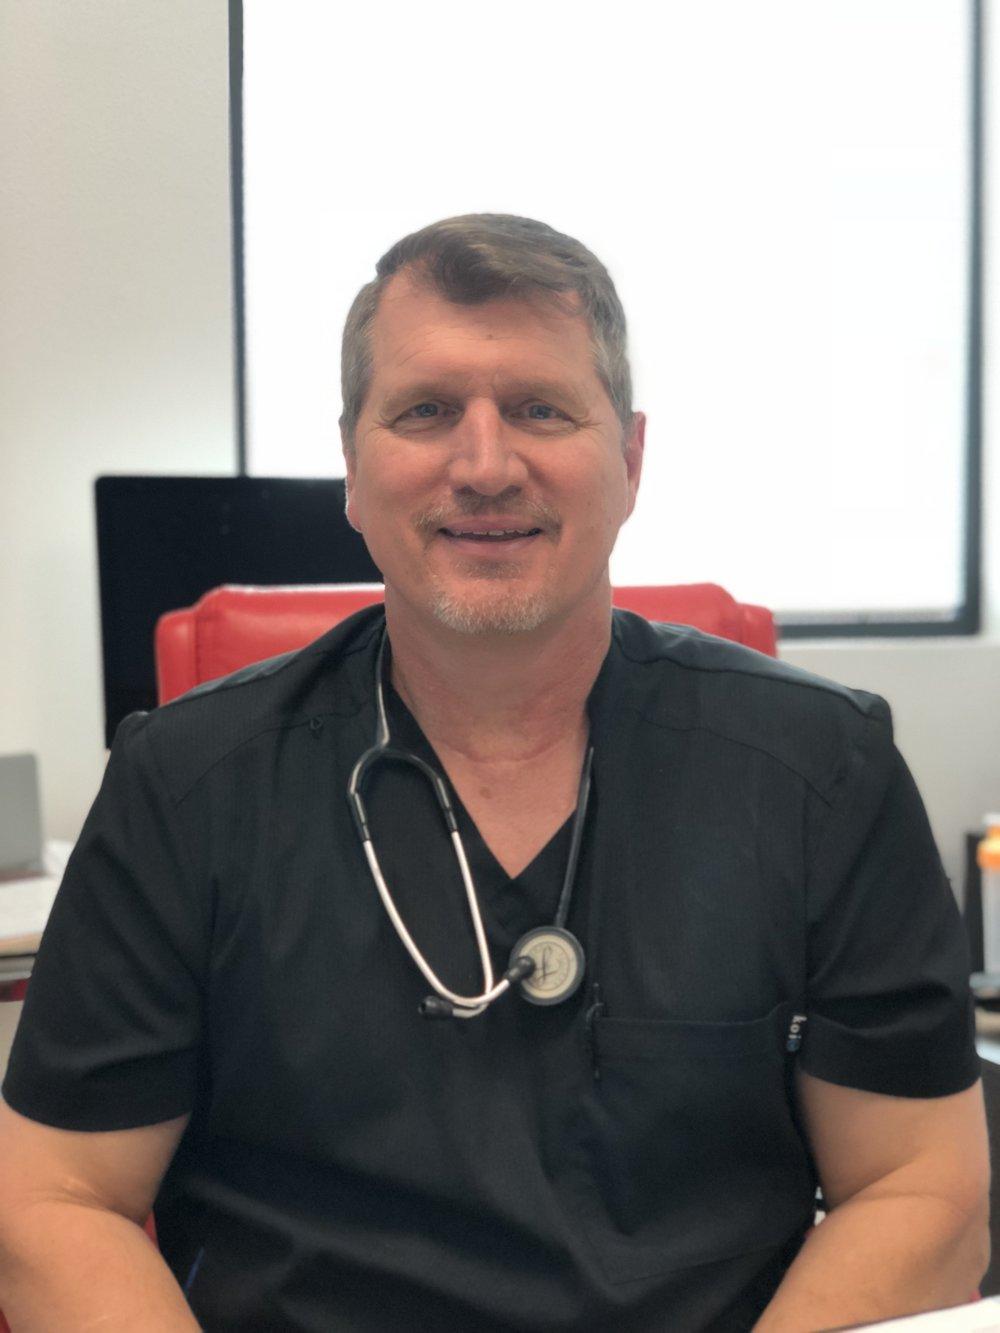 Dr. Steven Locnikar D.O. - Medical Director